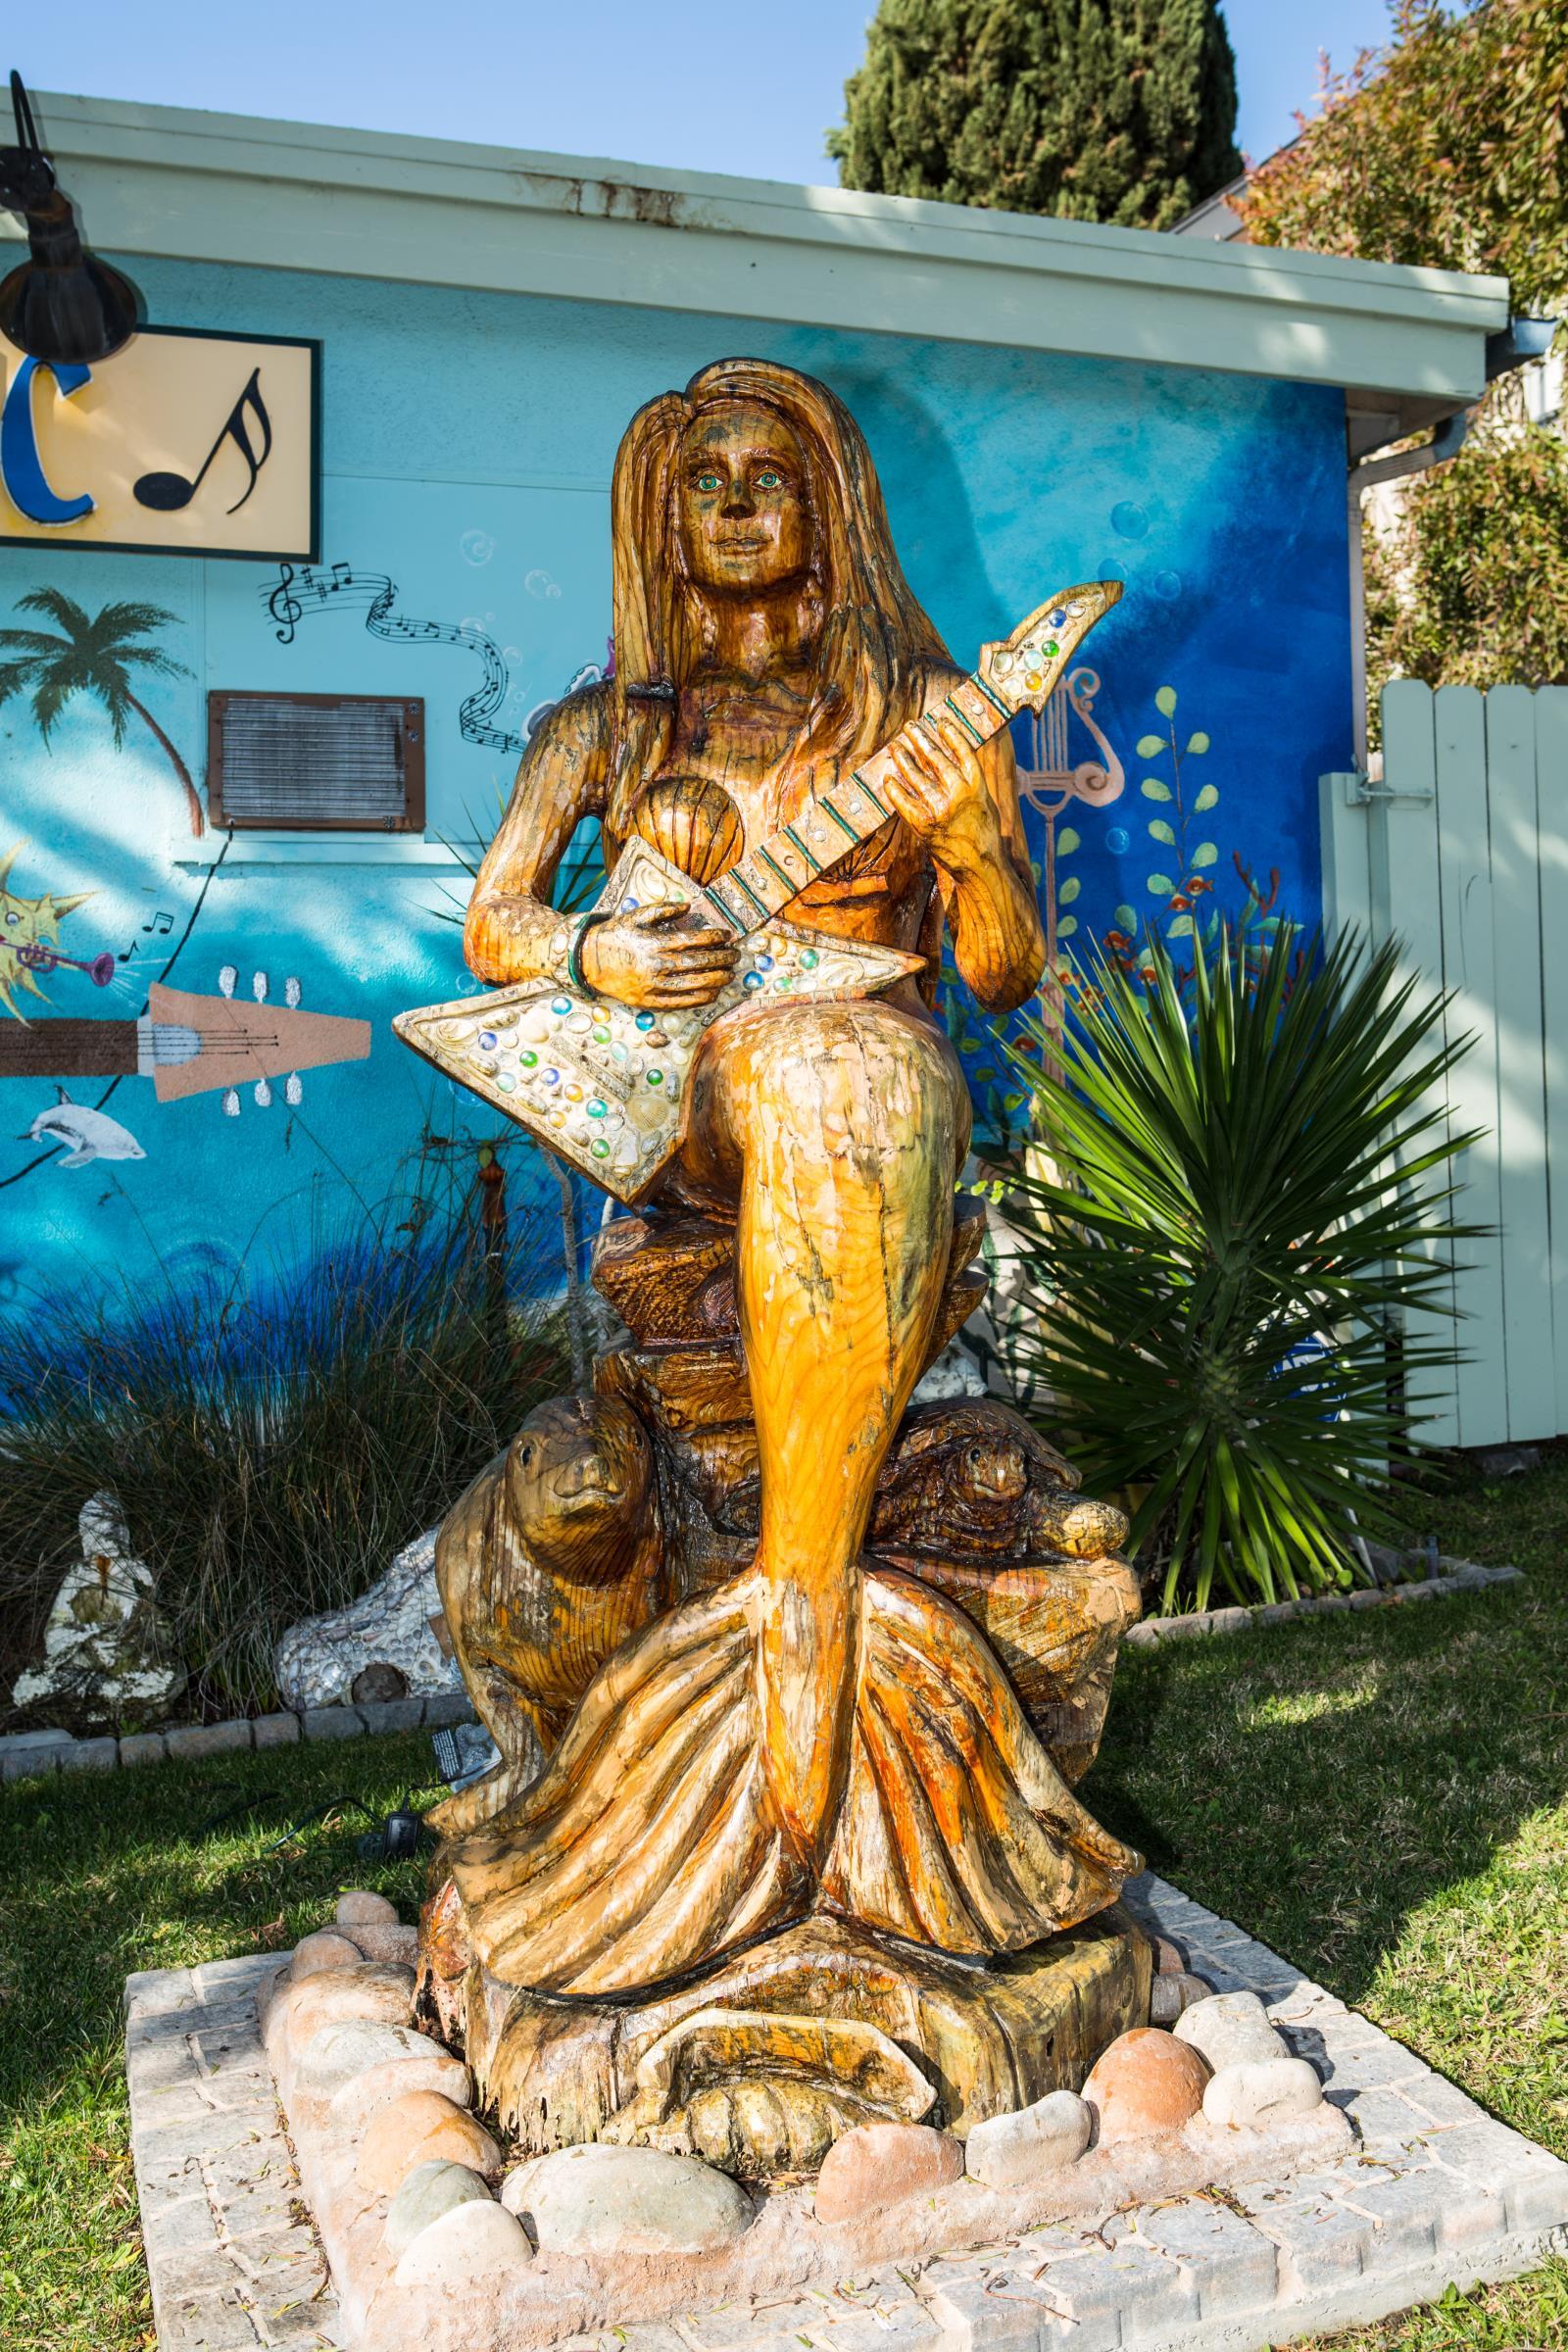 Wooden Mermaid City Of Dana Point